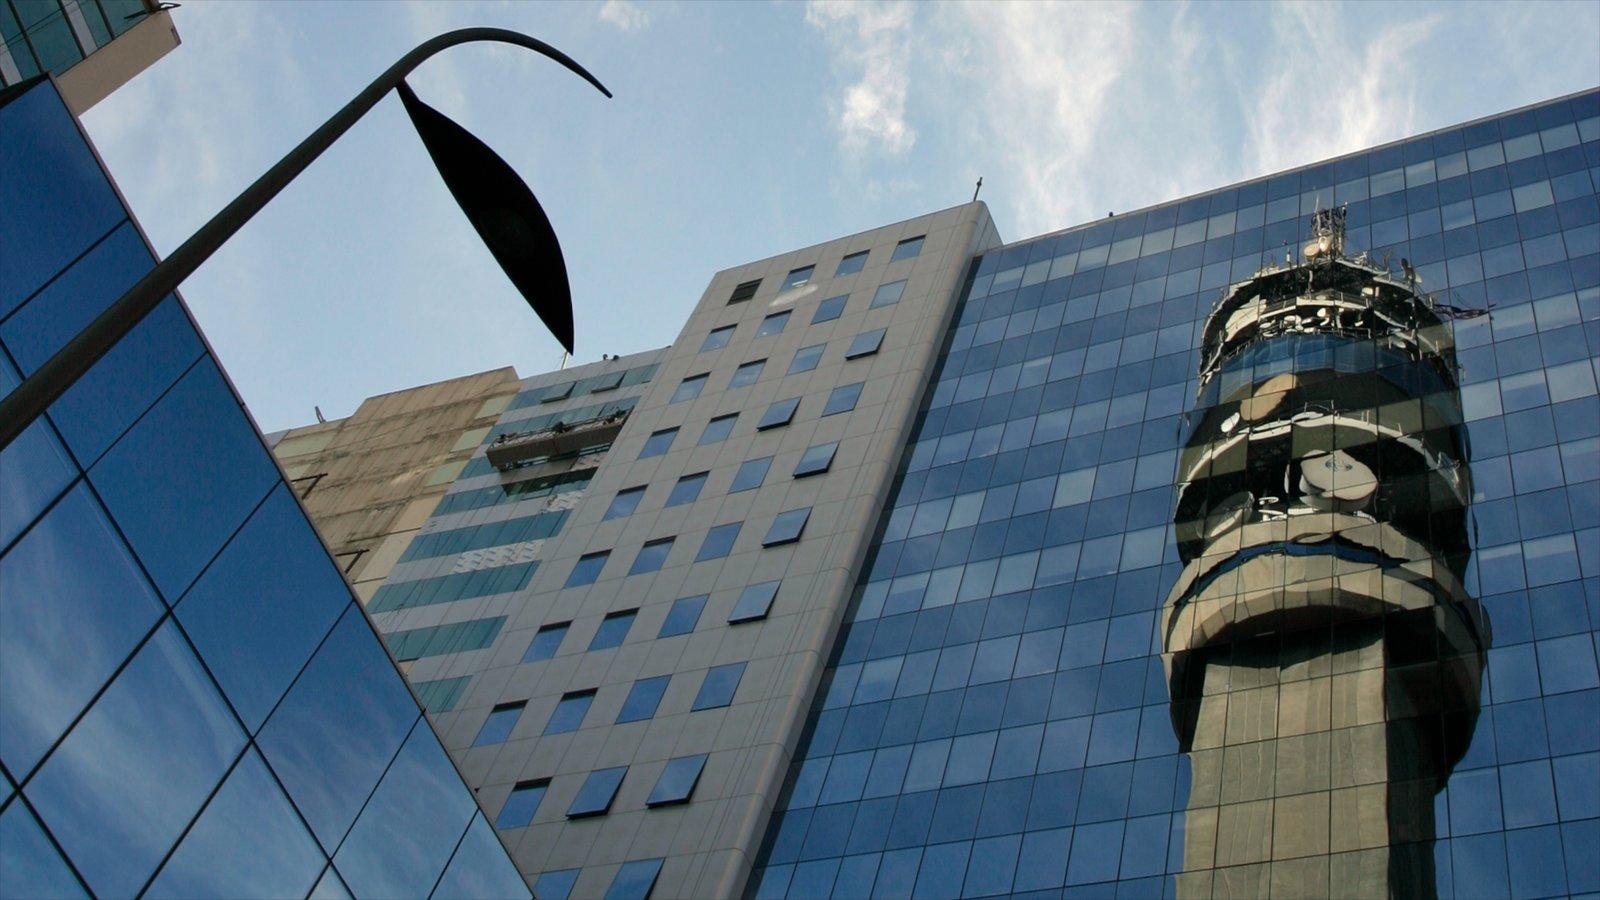 Santiago caracterizando distrito comercial central, um edifício e uma cidade